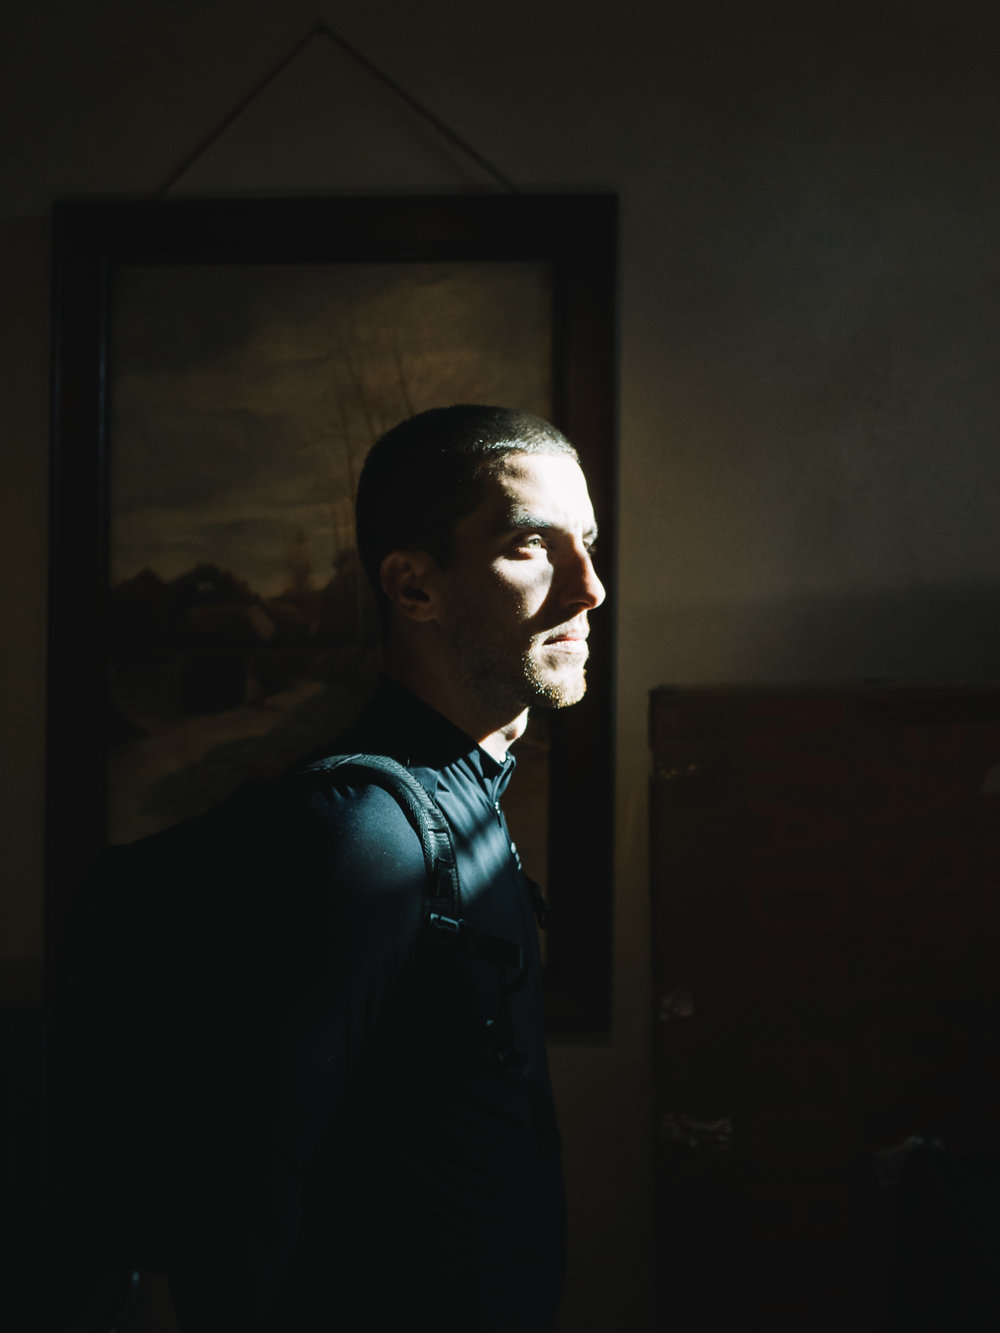 unsettle-co-lifestyle-blog-cyclist-interview-Keith-Morrison-self-portrait